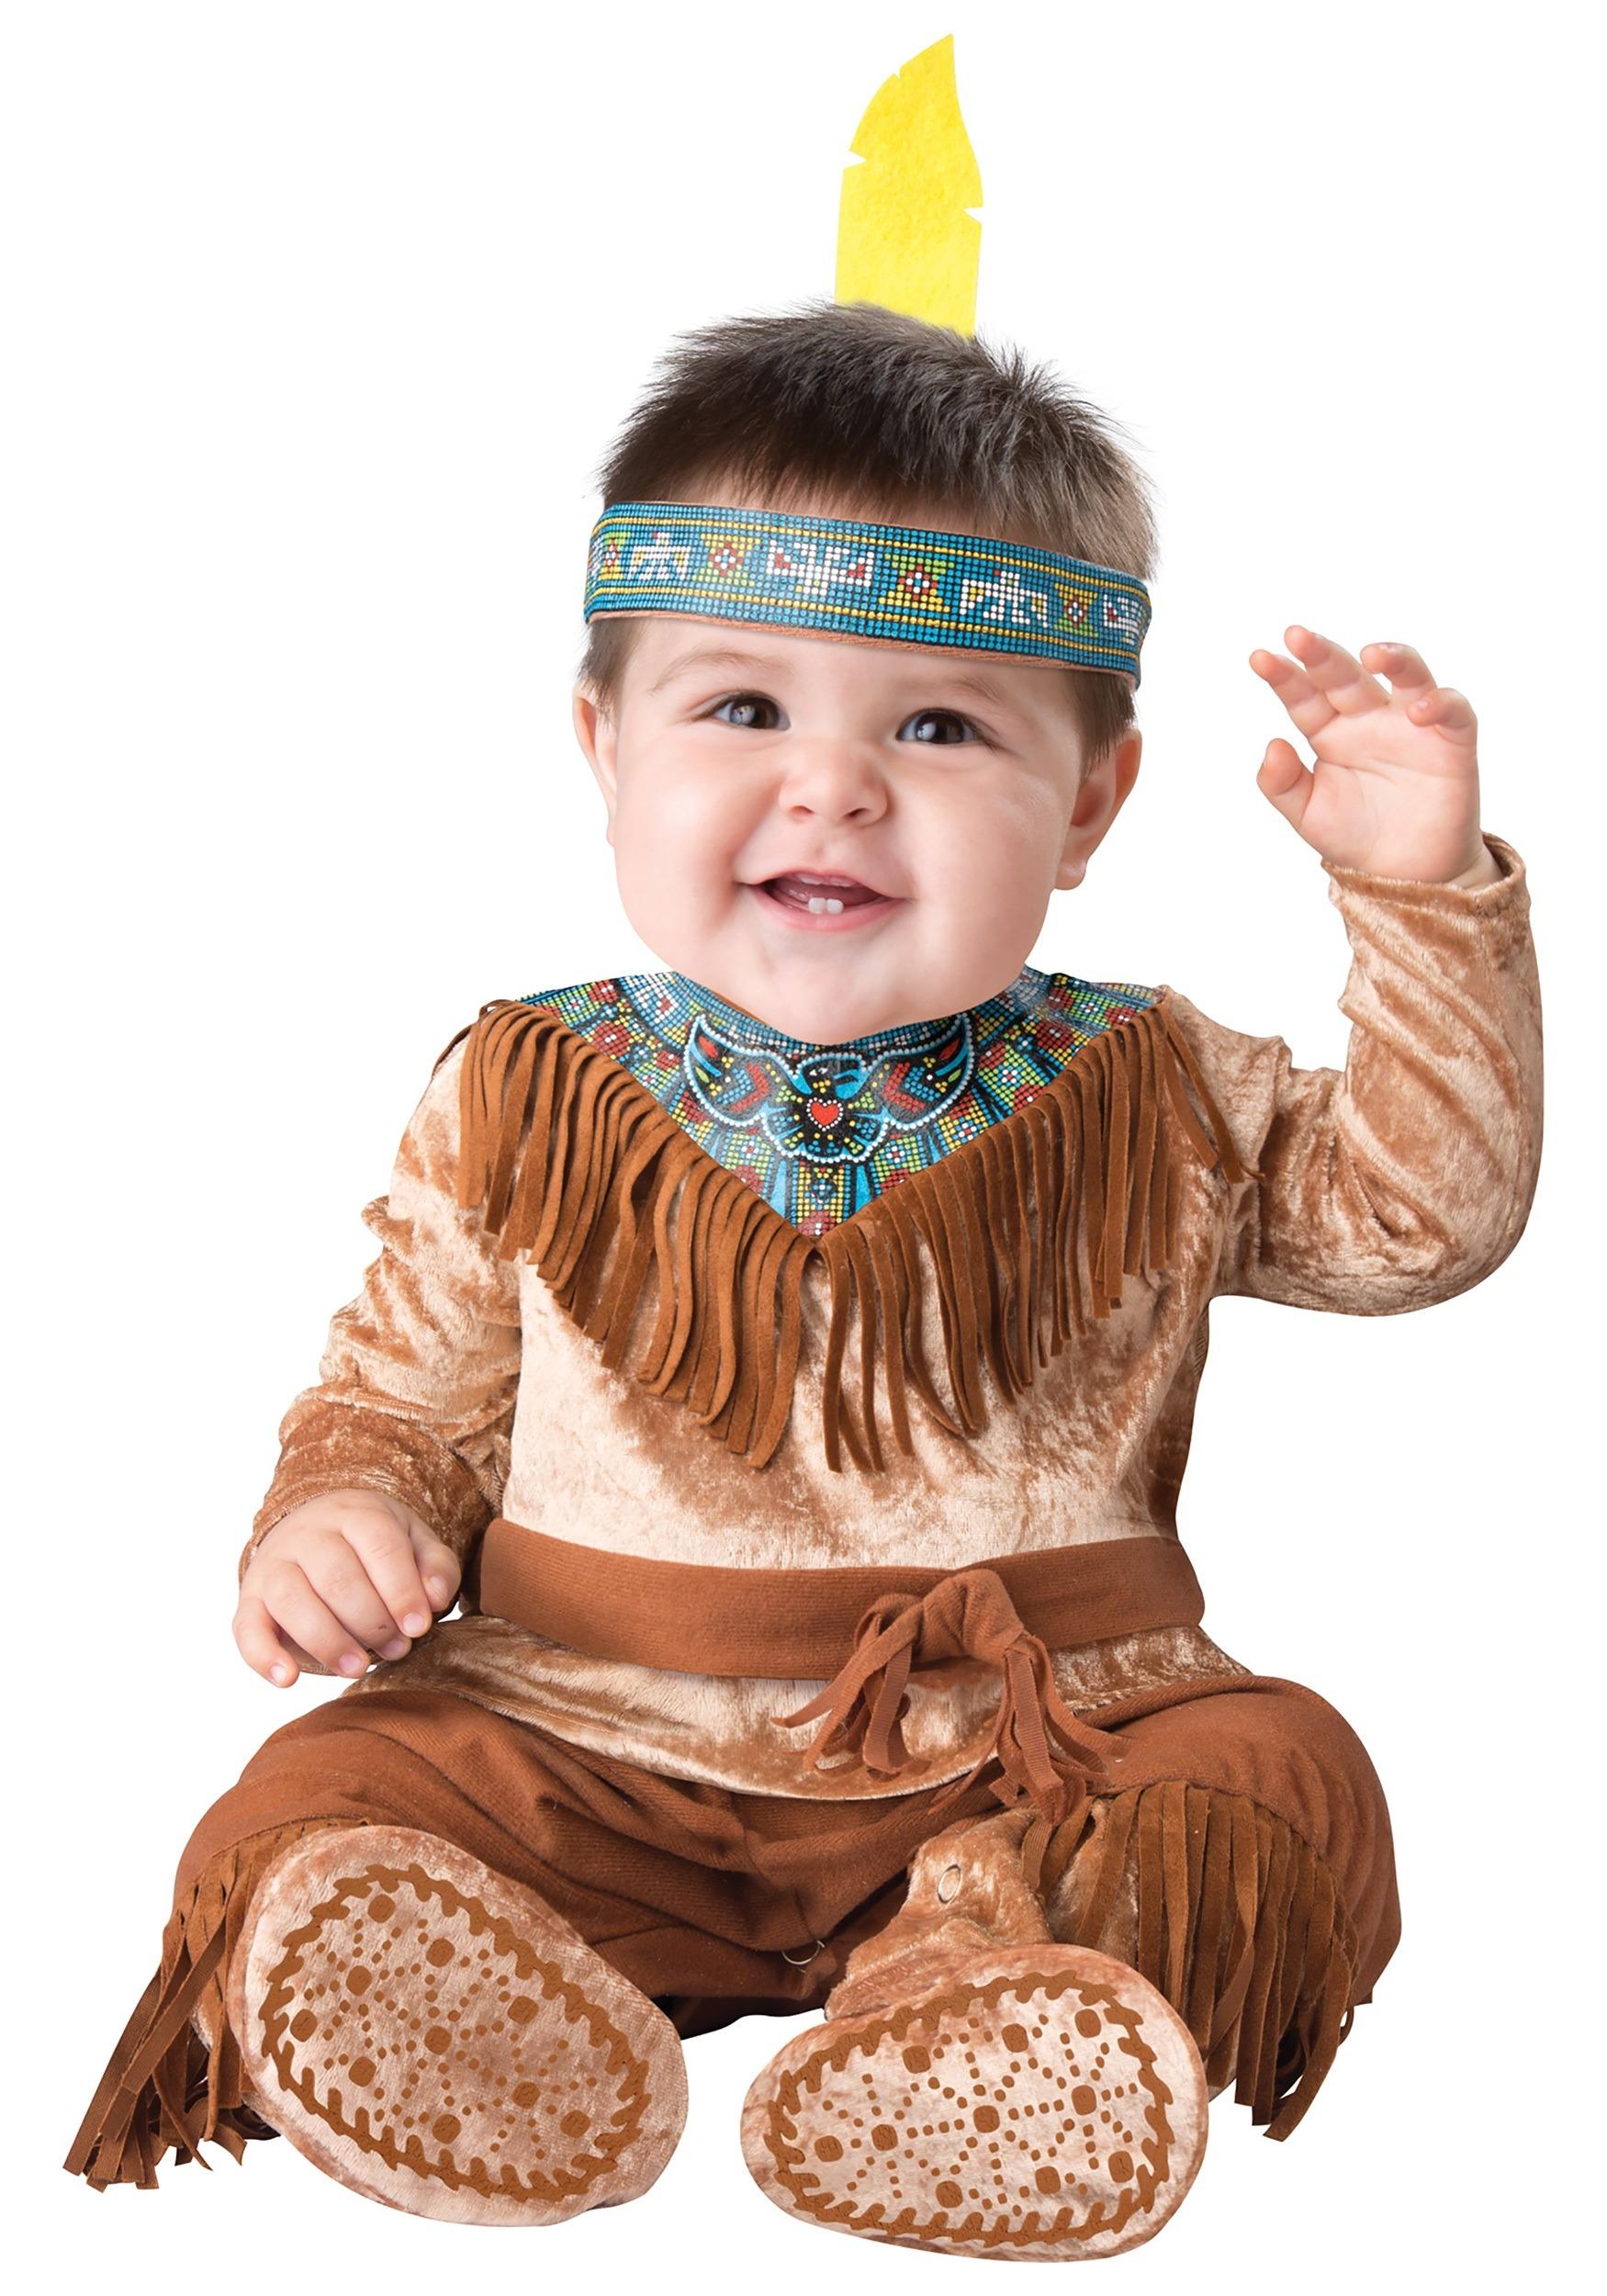 sweet dream catcher infant costume